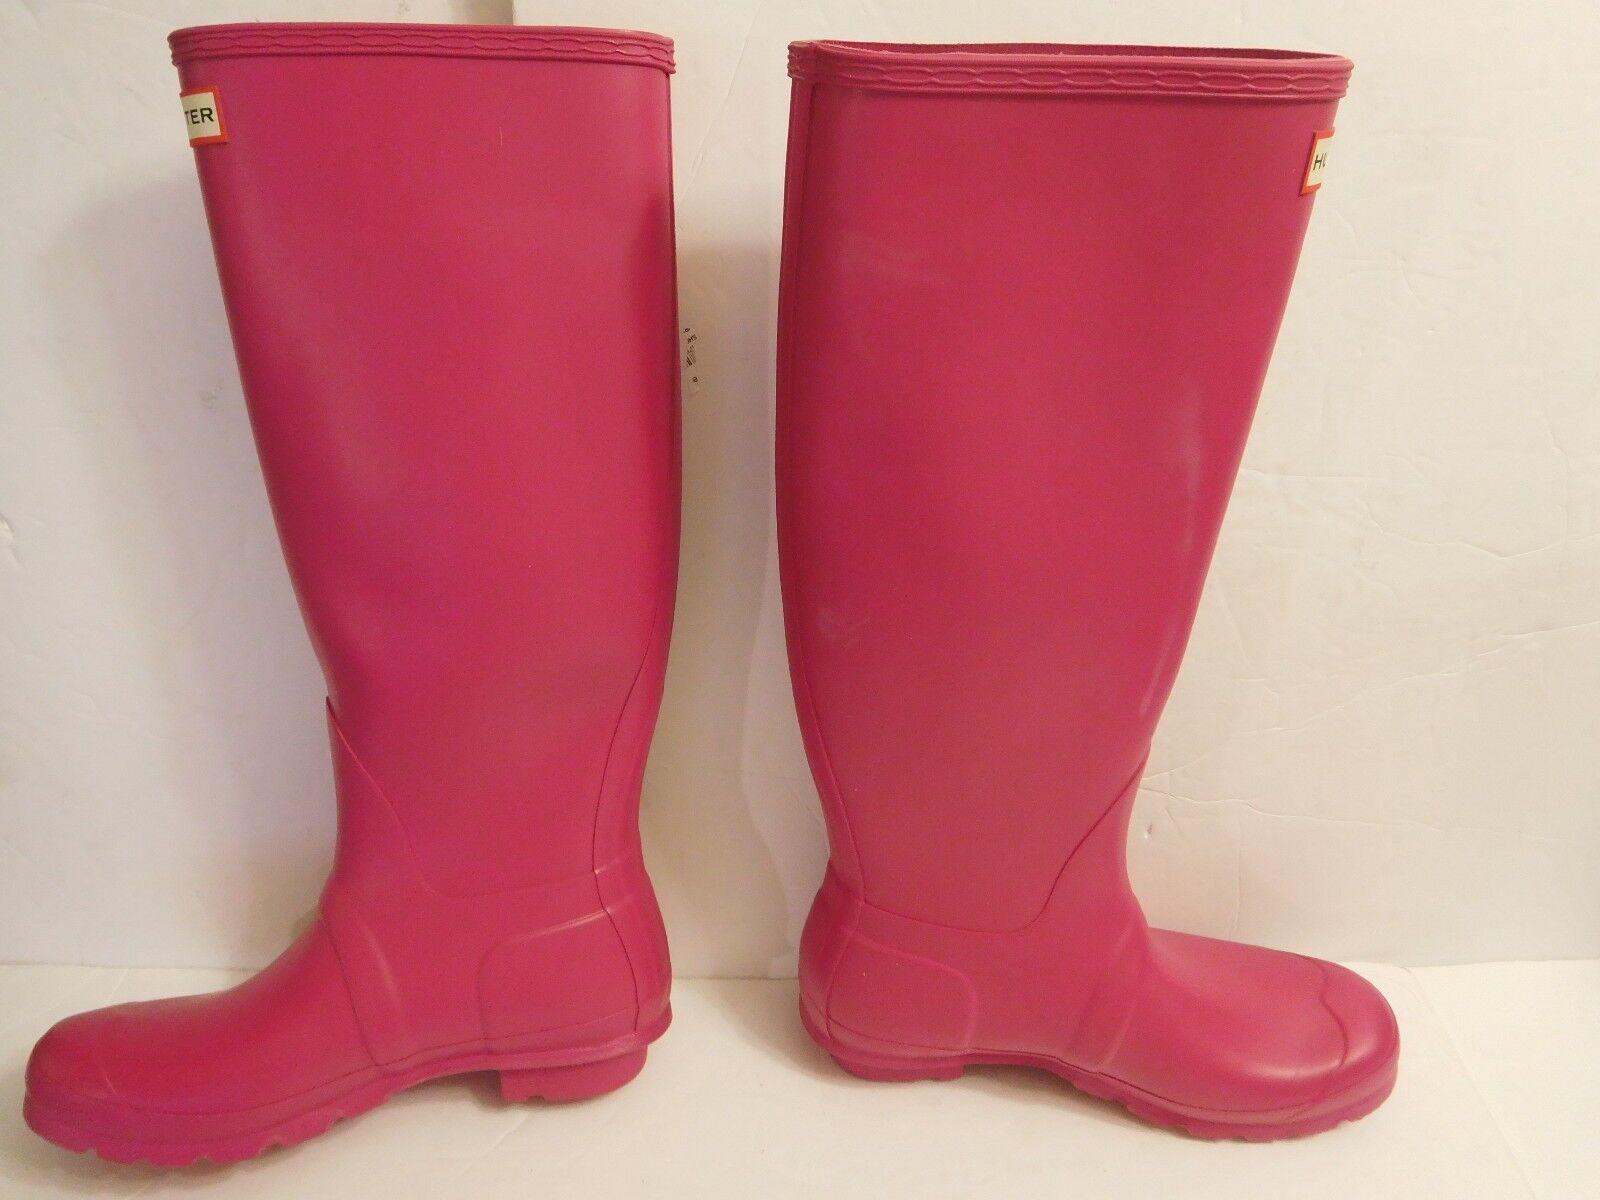 B-35 Hunter 'Original Tall' Rain Boot pink (Women)  Sz 8 150.00